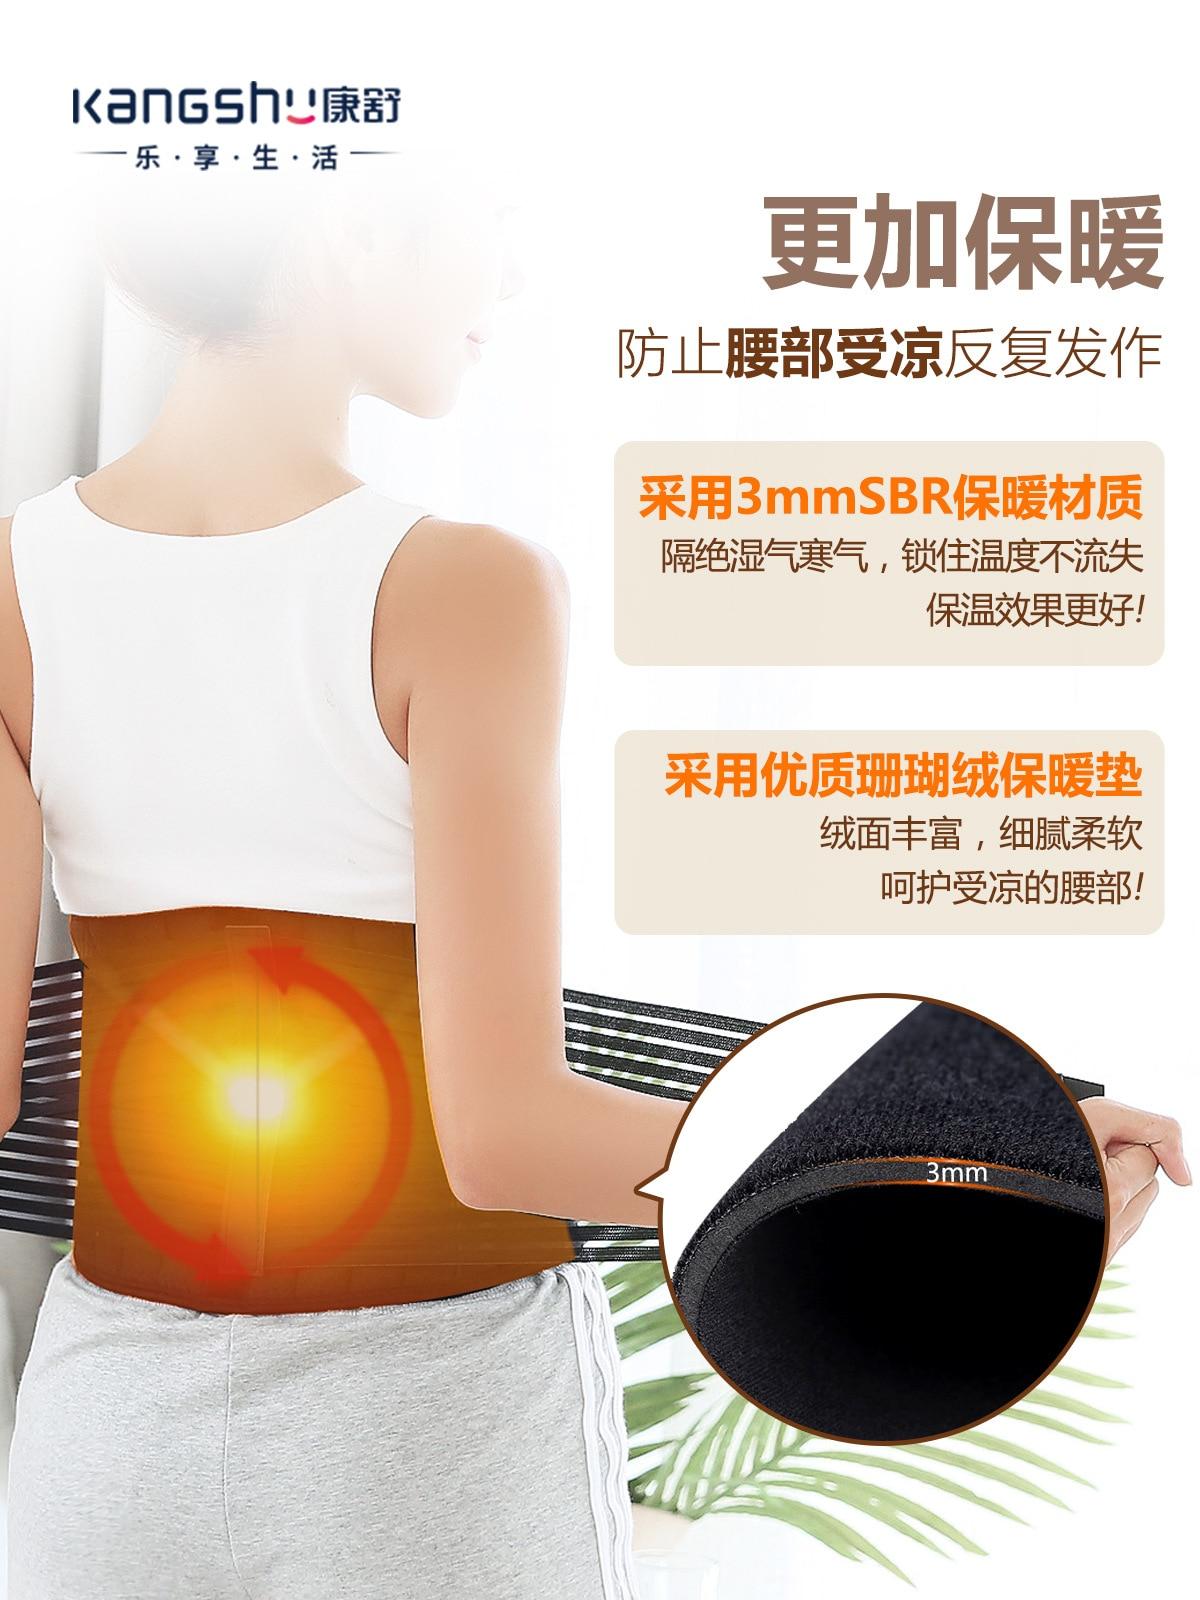 Suitable For Kangshu Waist Supporter Warm Women's Lumbar Disc Self Heating Slipped Disc Strain Back Pain Girdle Waist Cold Warm